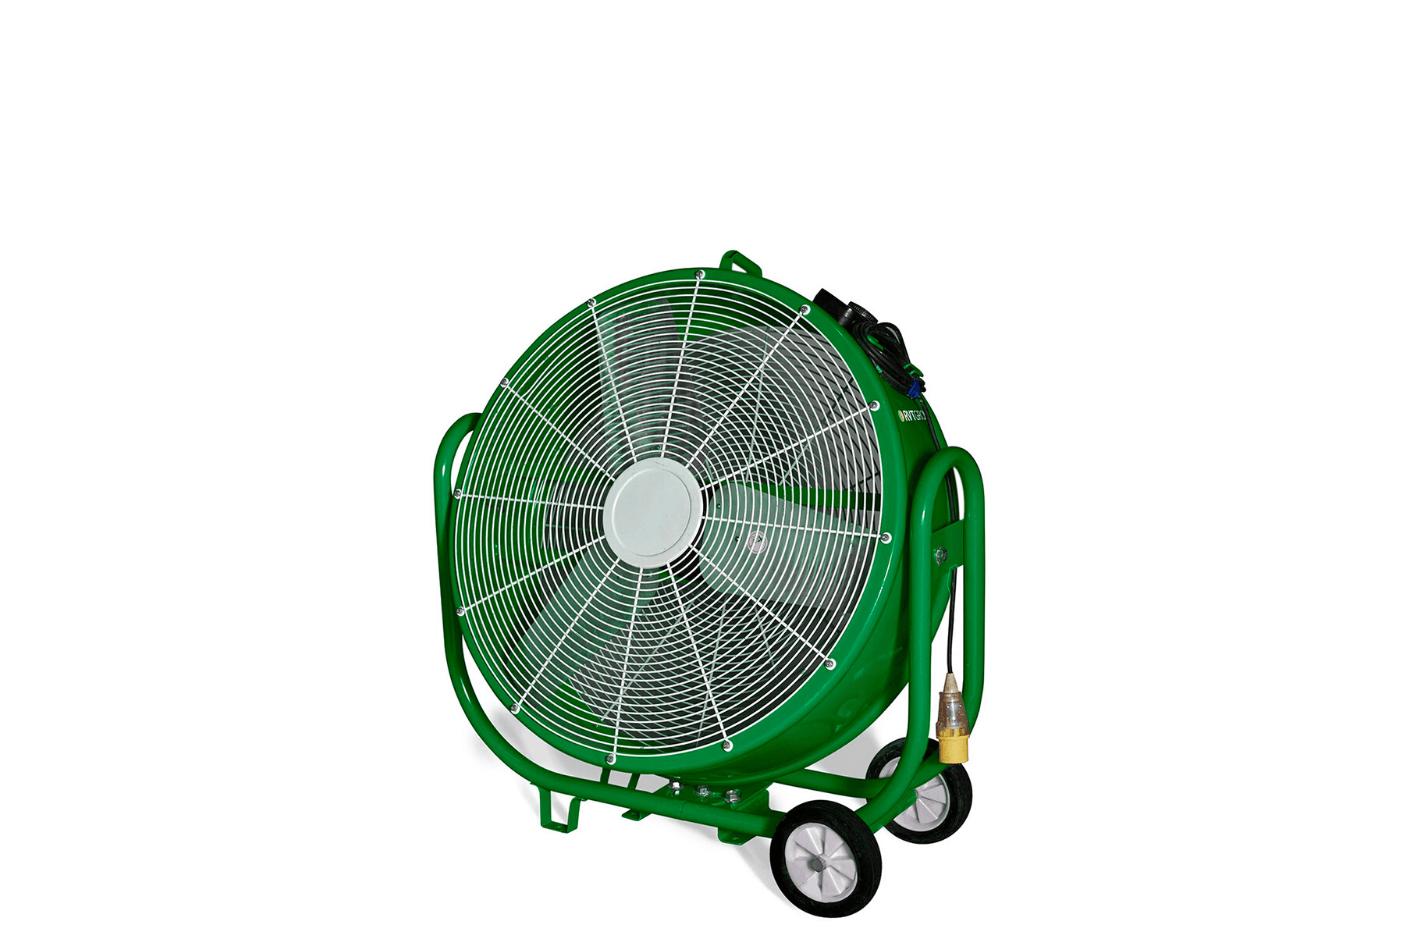 Ventex Floor Fan 900 M_Ventilation Equipment